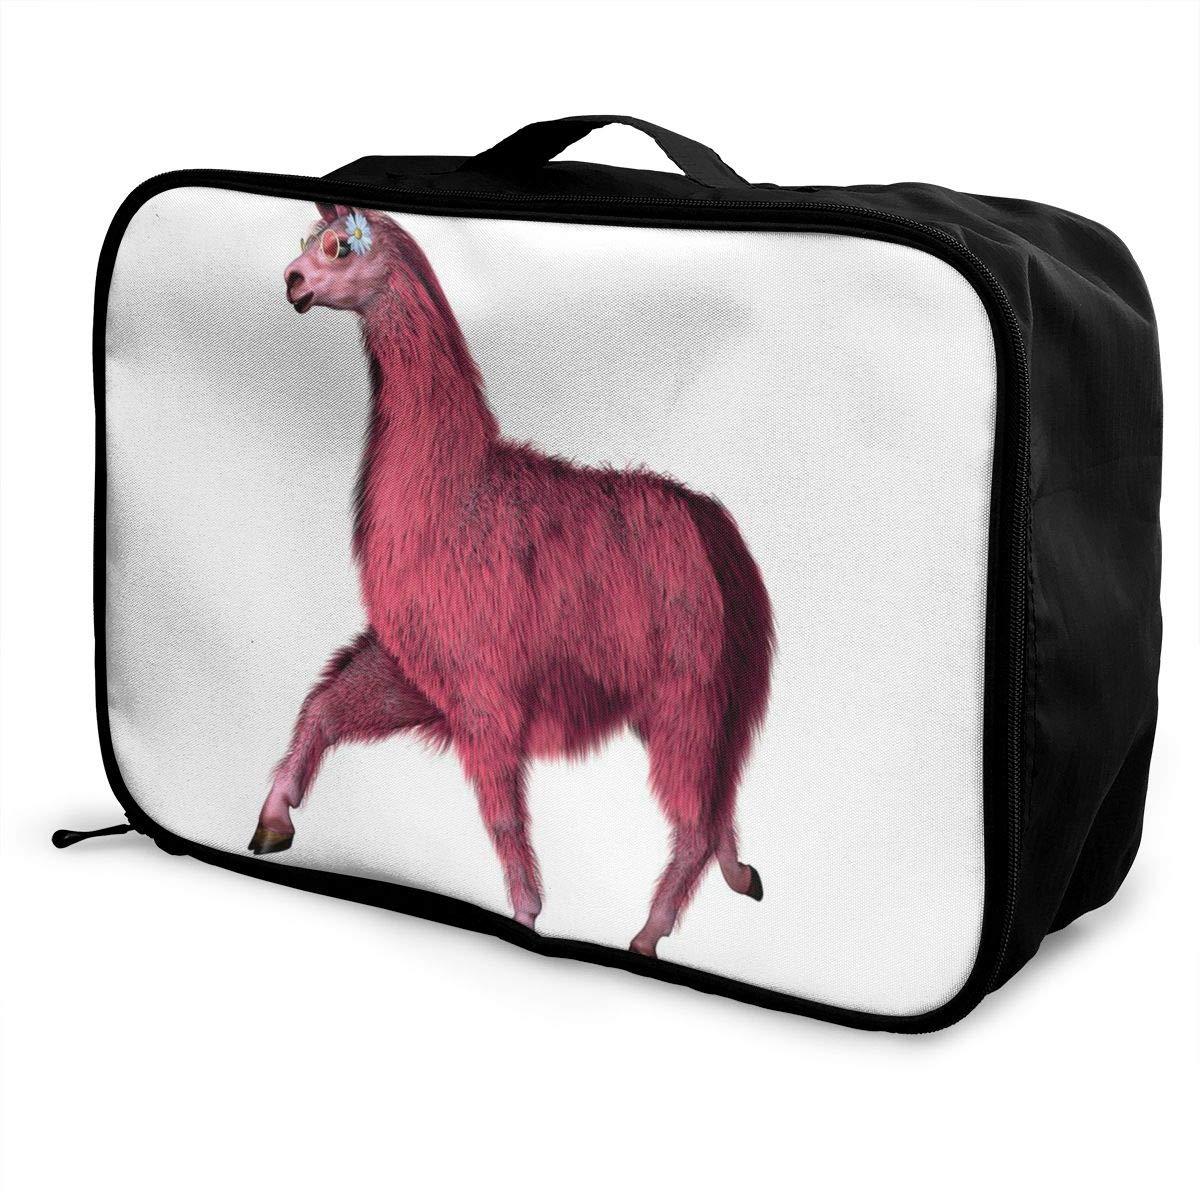 Canvas Travel Weekender Bag,Fashion Custom Lightweight Large Capacity Portable Luggage Bag,Suitcase Trolley Bag ADGAI Path-resize 10